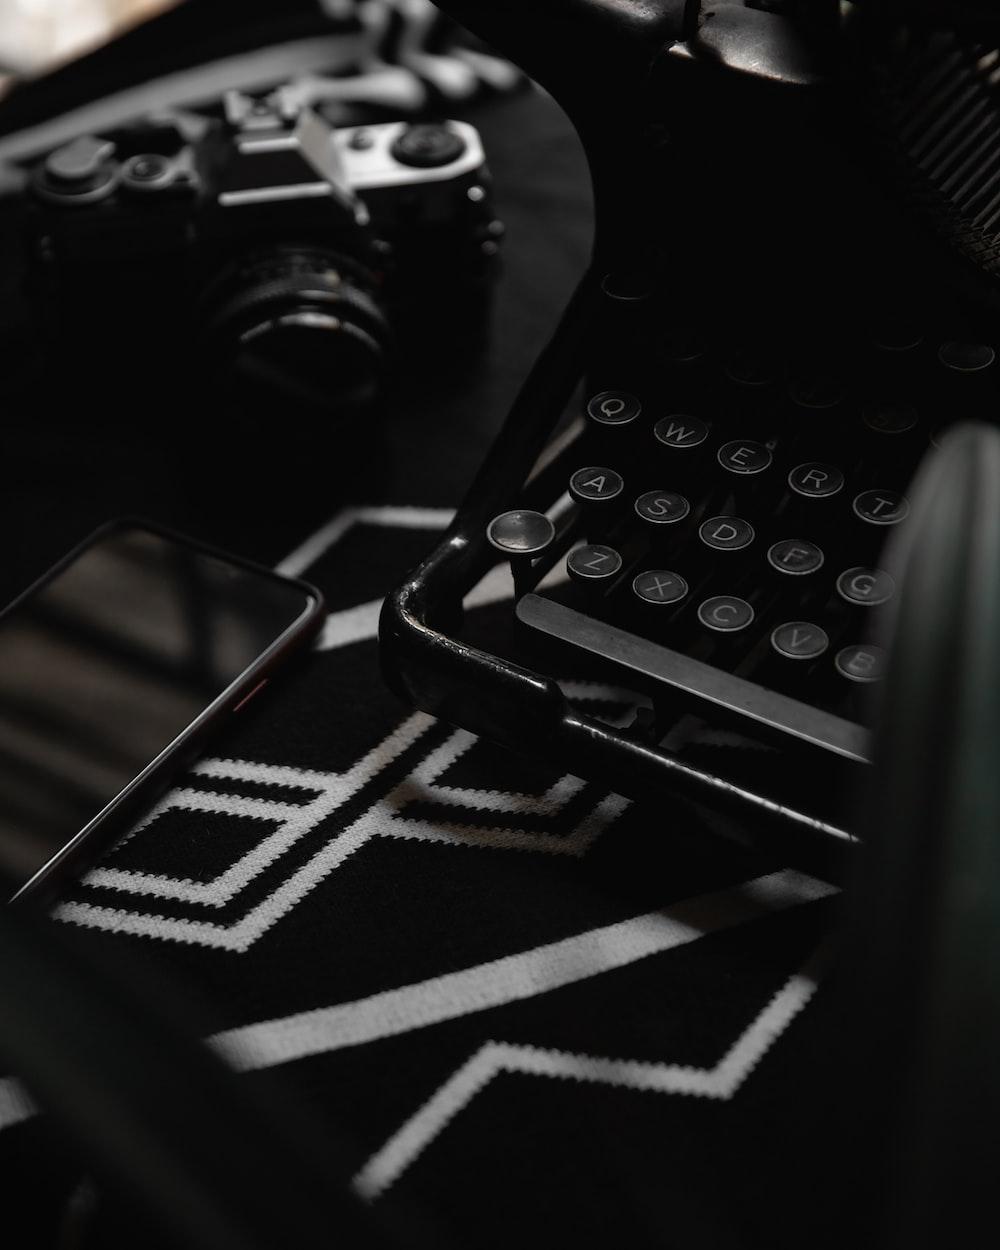 black and white typewriter on black and white textile